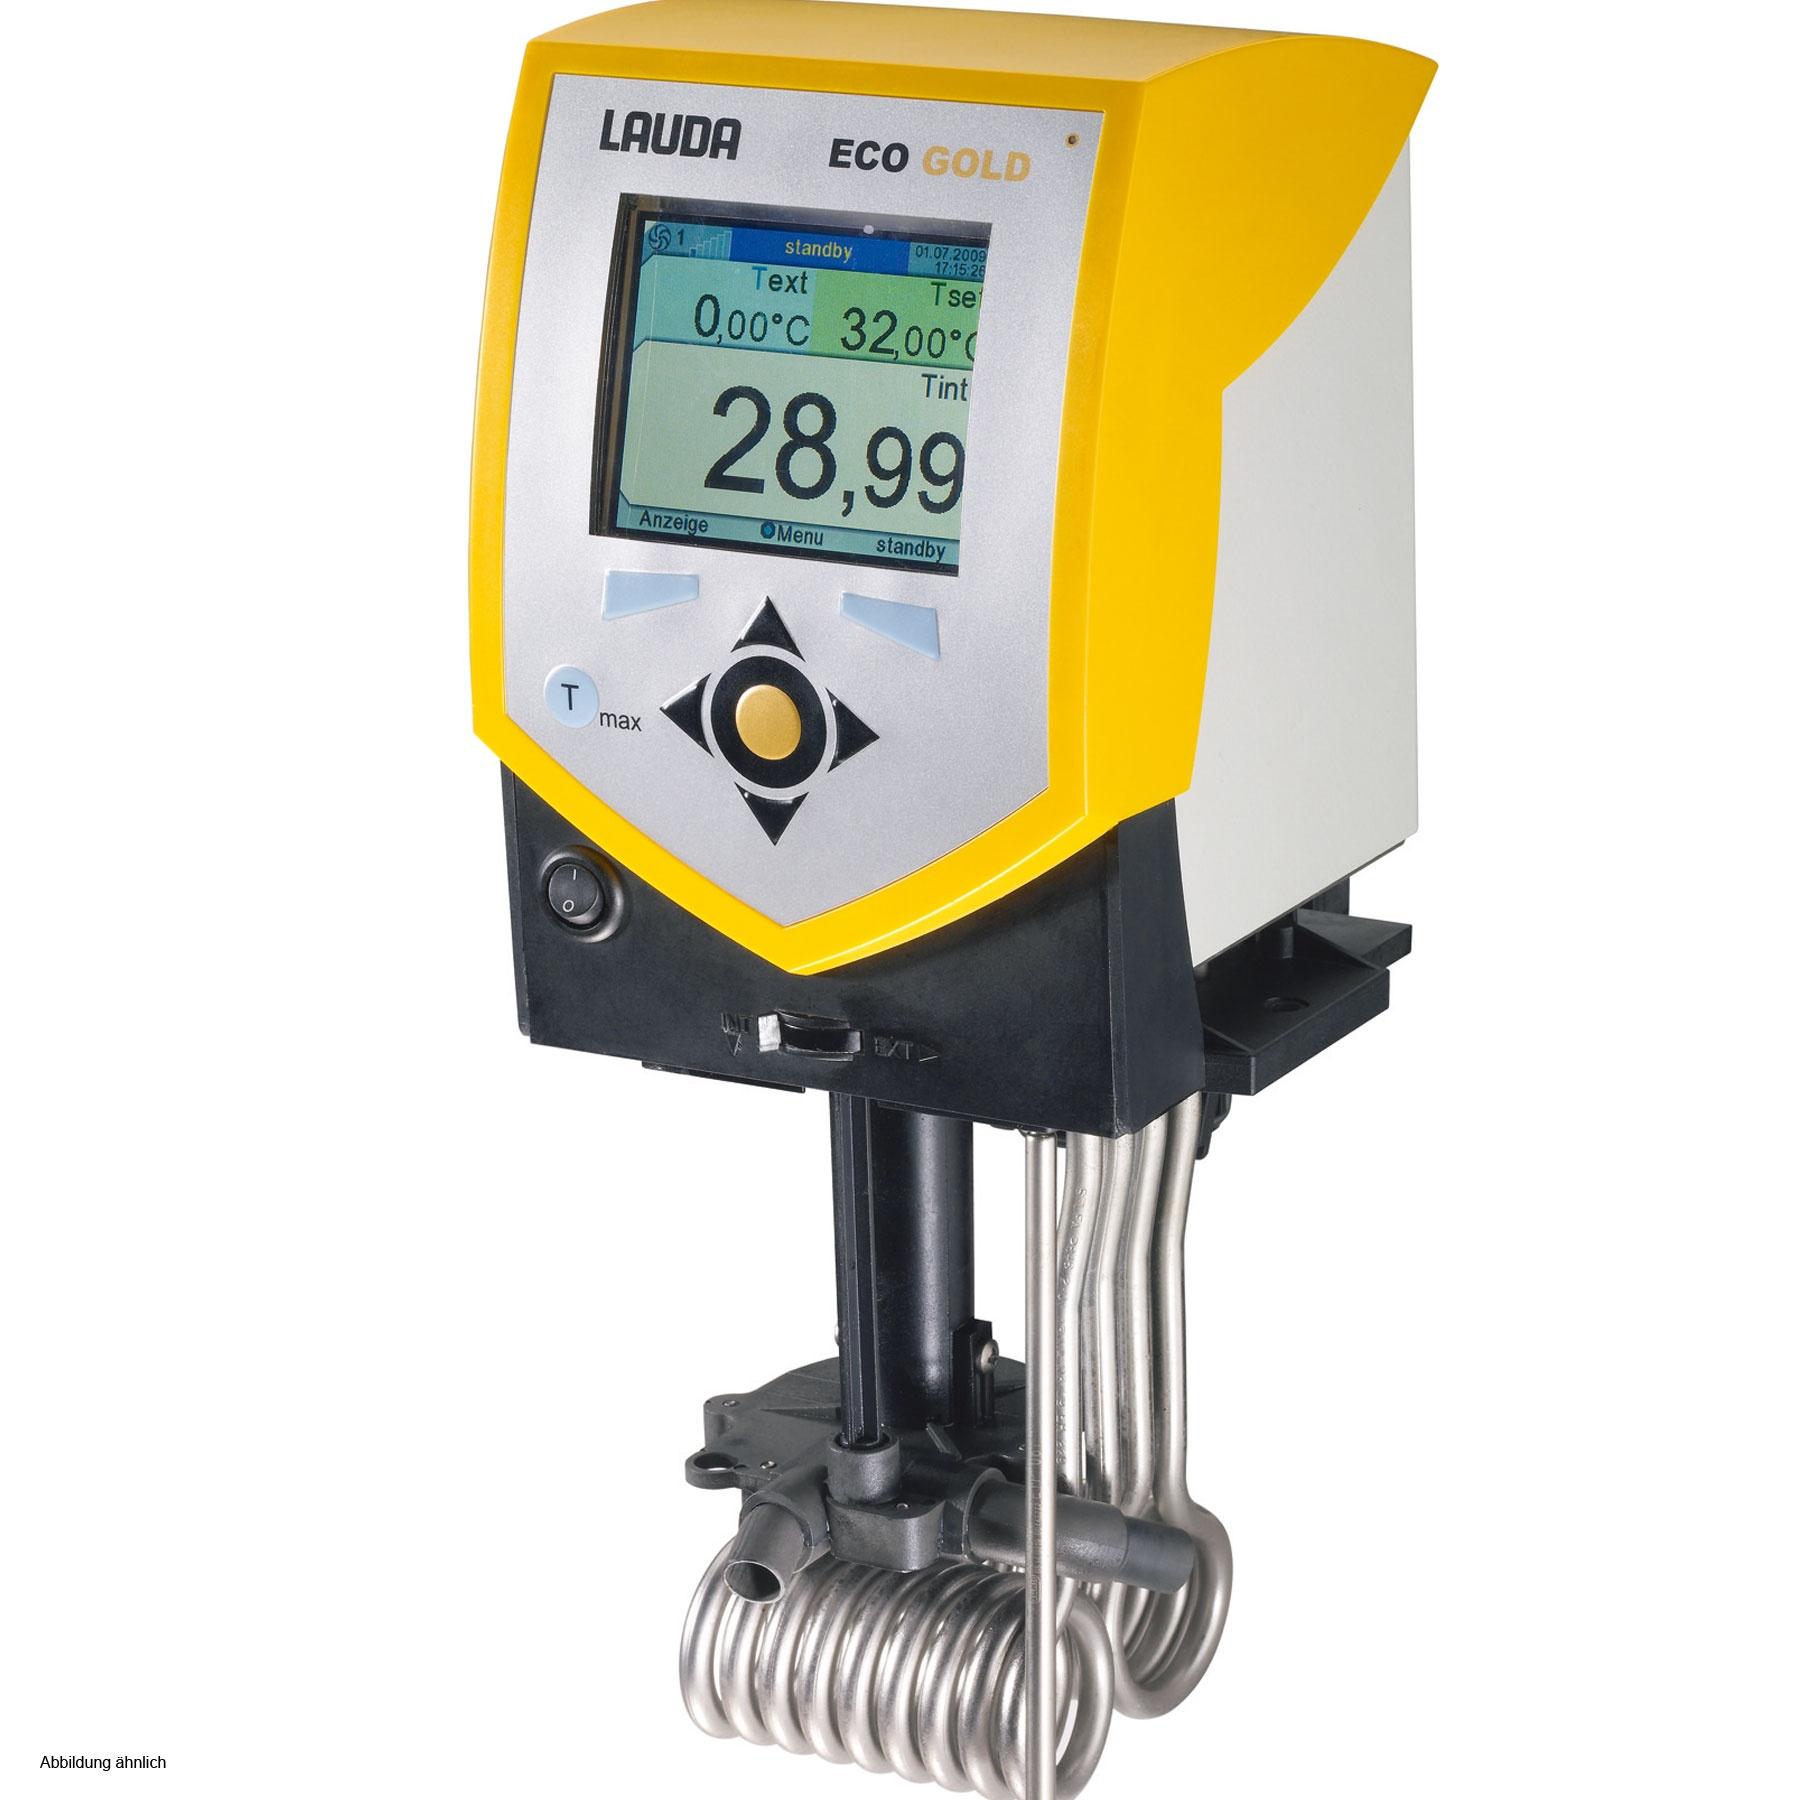 Termostato Eco Silver Faixa de Trabalho de 20°C a 200°C - LAUDA - Cod.ECOSILVER